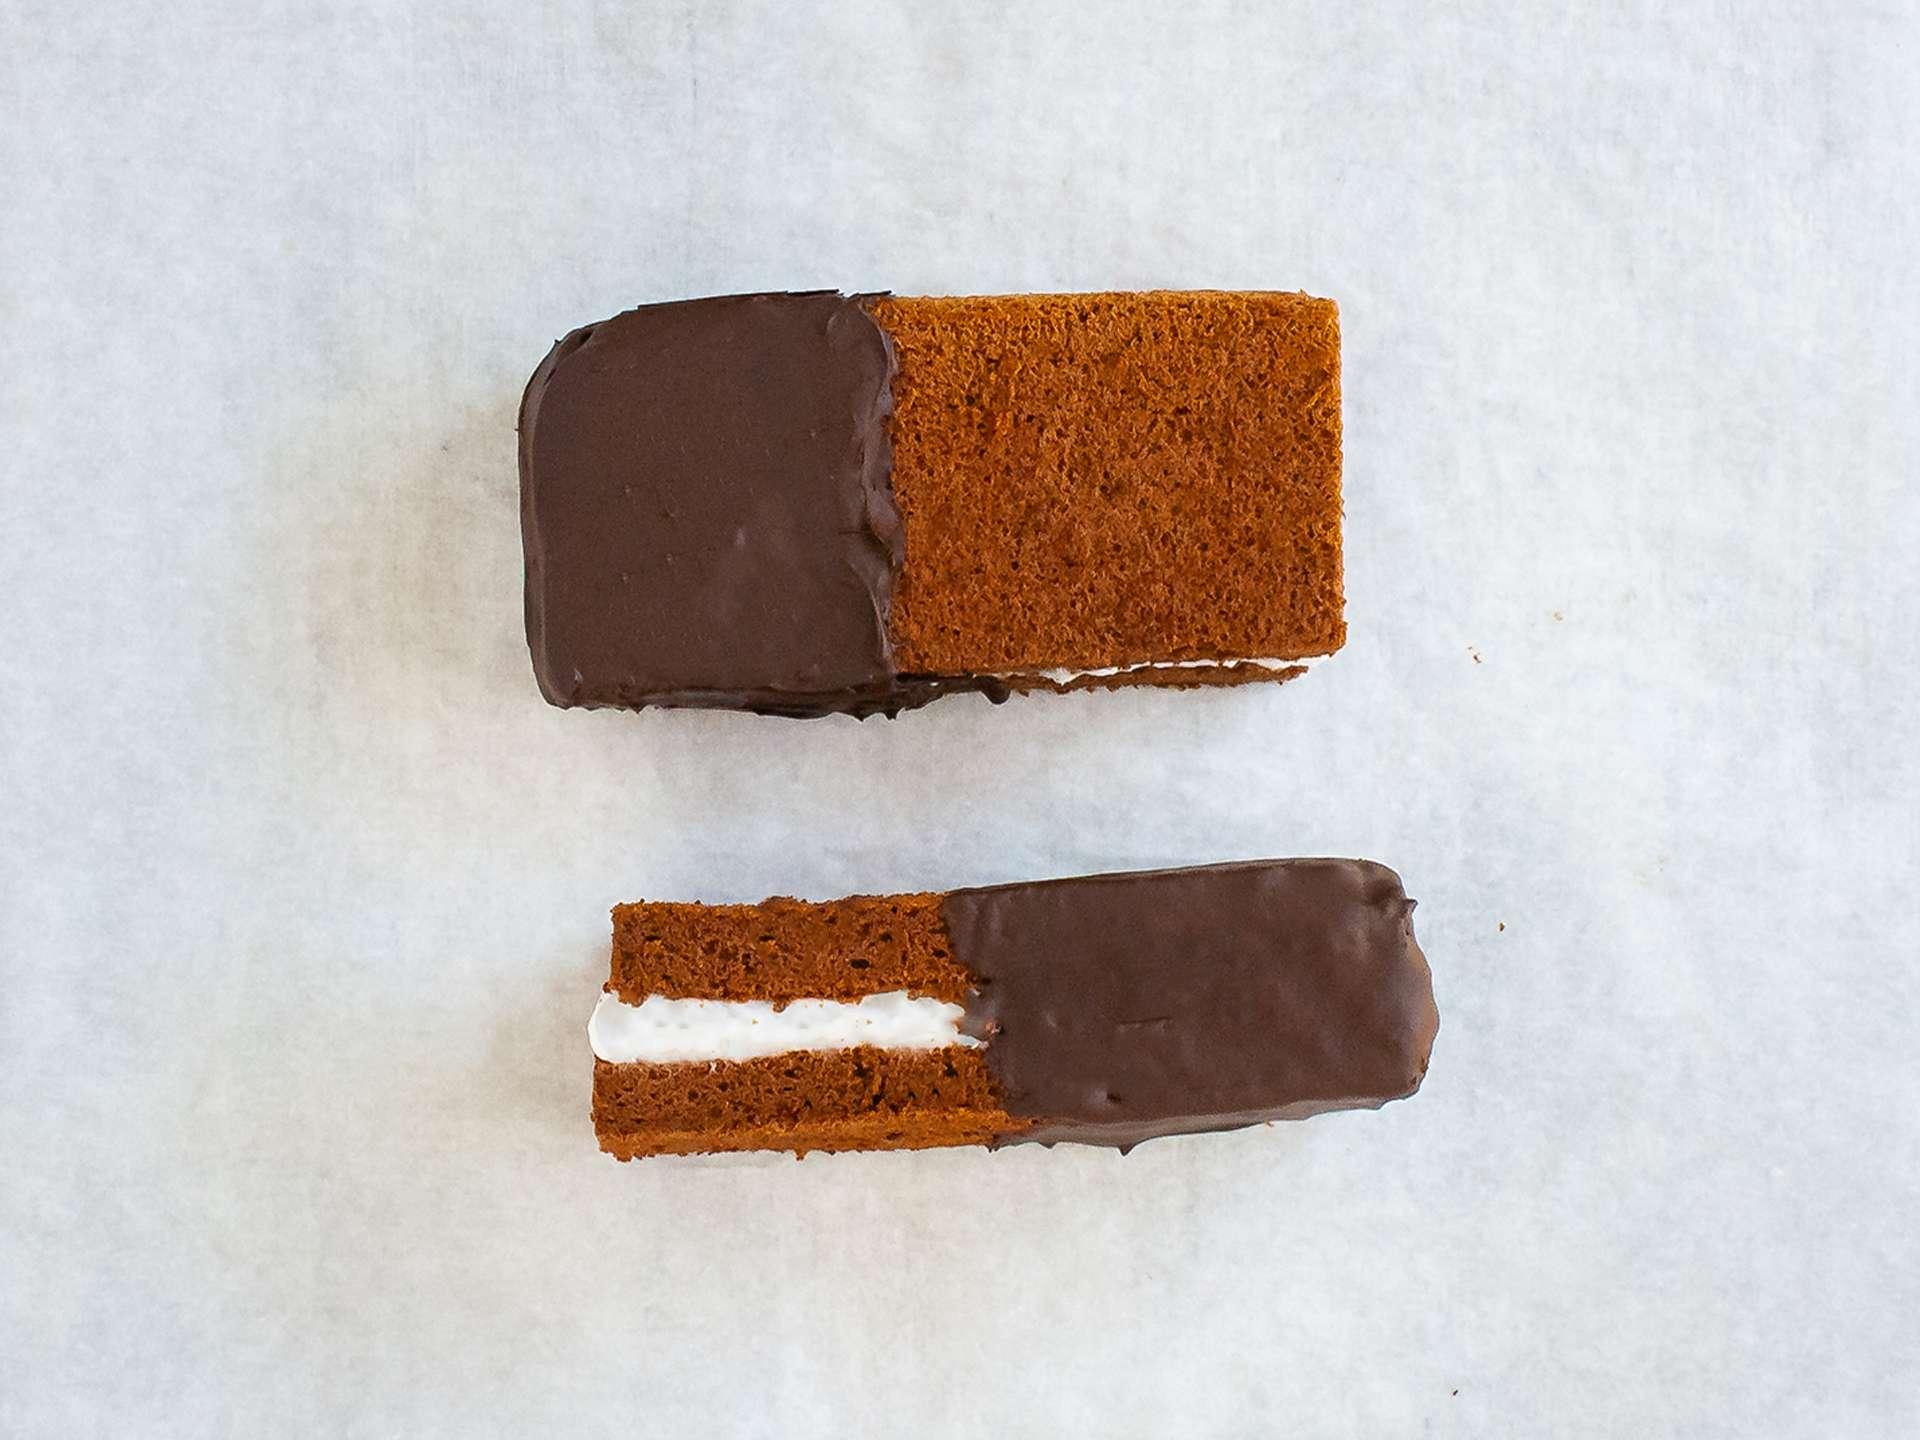 Step 5.2 of Dairy Free Chocolate Sandwich Cake Bar